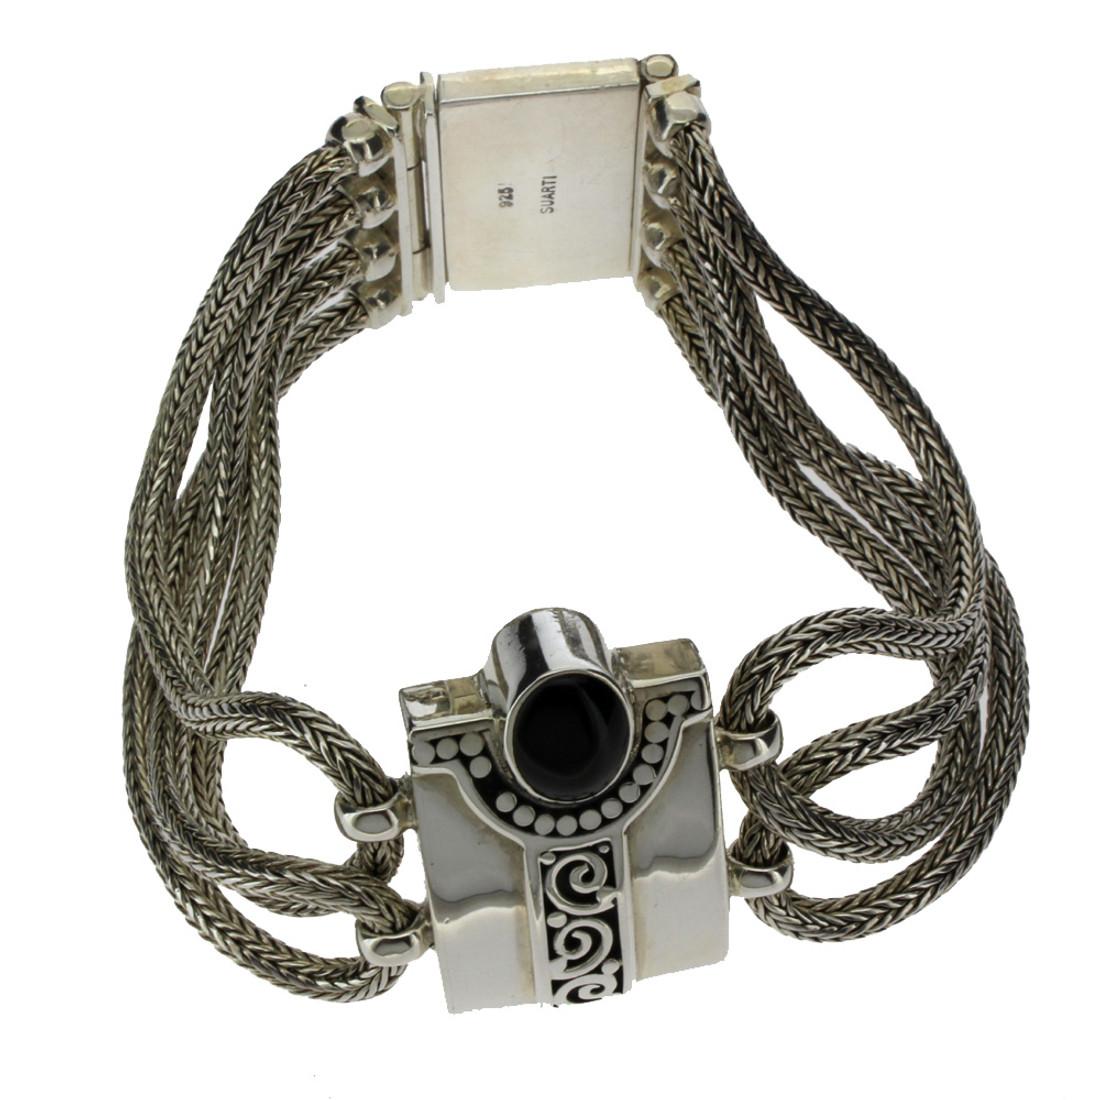 Bali Onyx sterling silver bracelet.